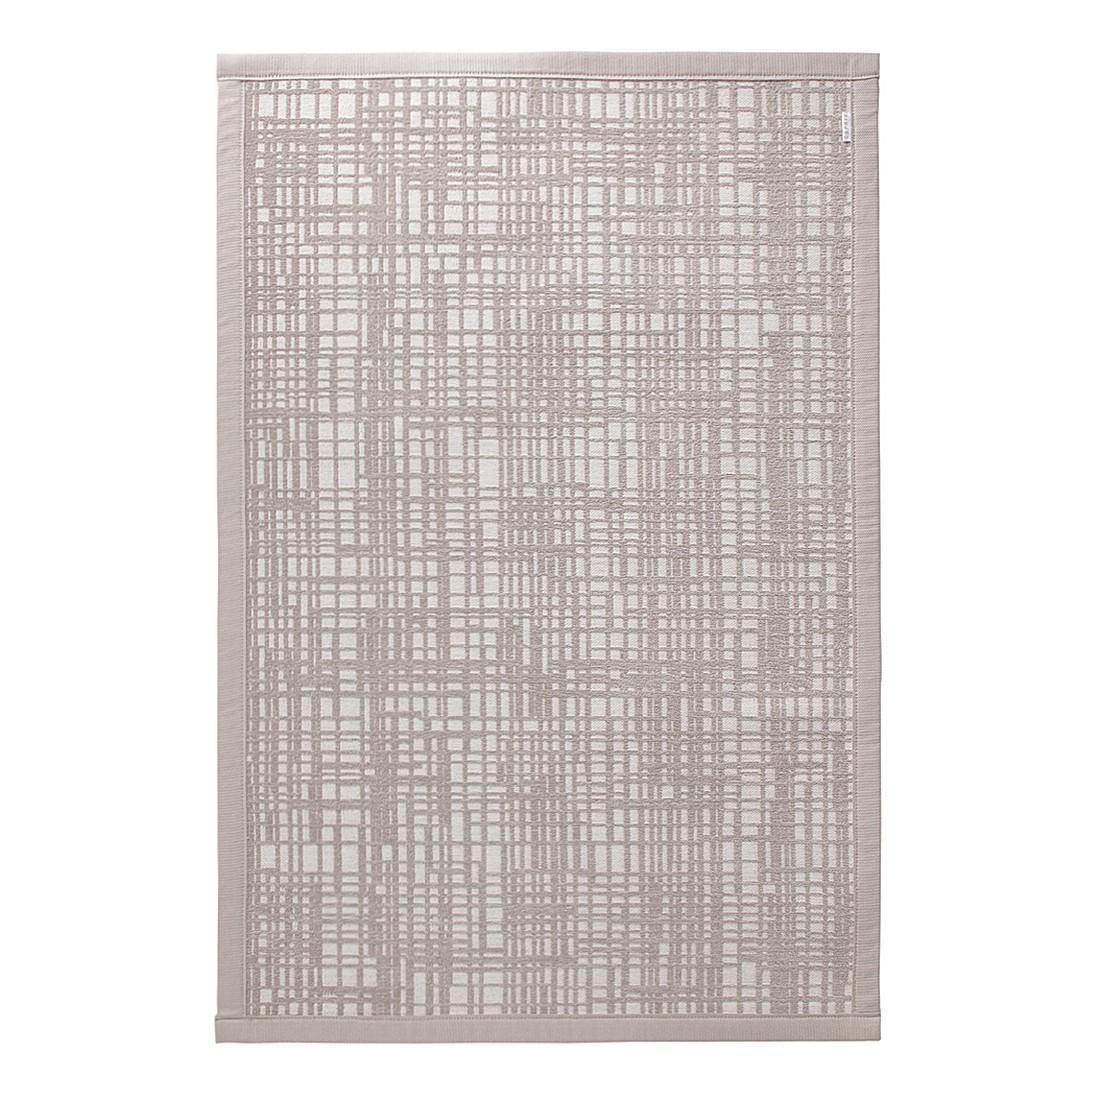 Home 24 - Tapis de bain graficule - beige - 53 x 65 cm, esprit home